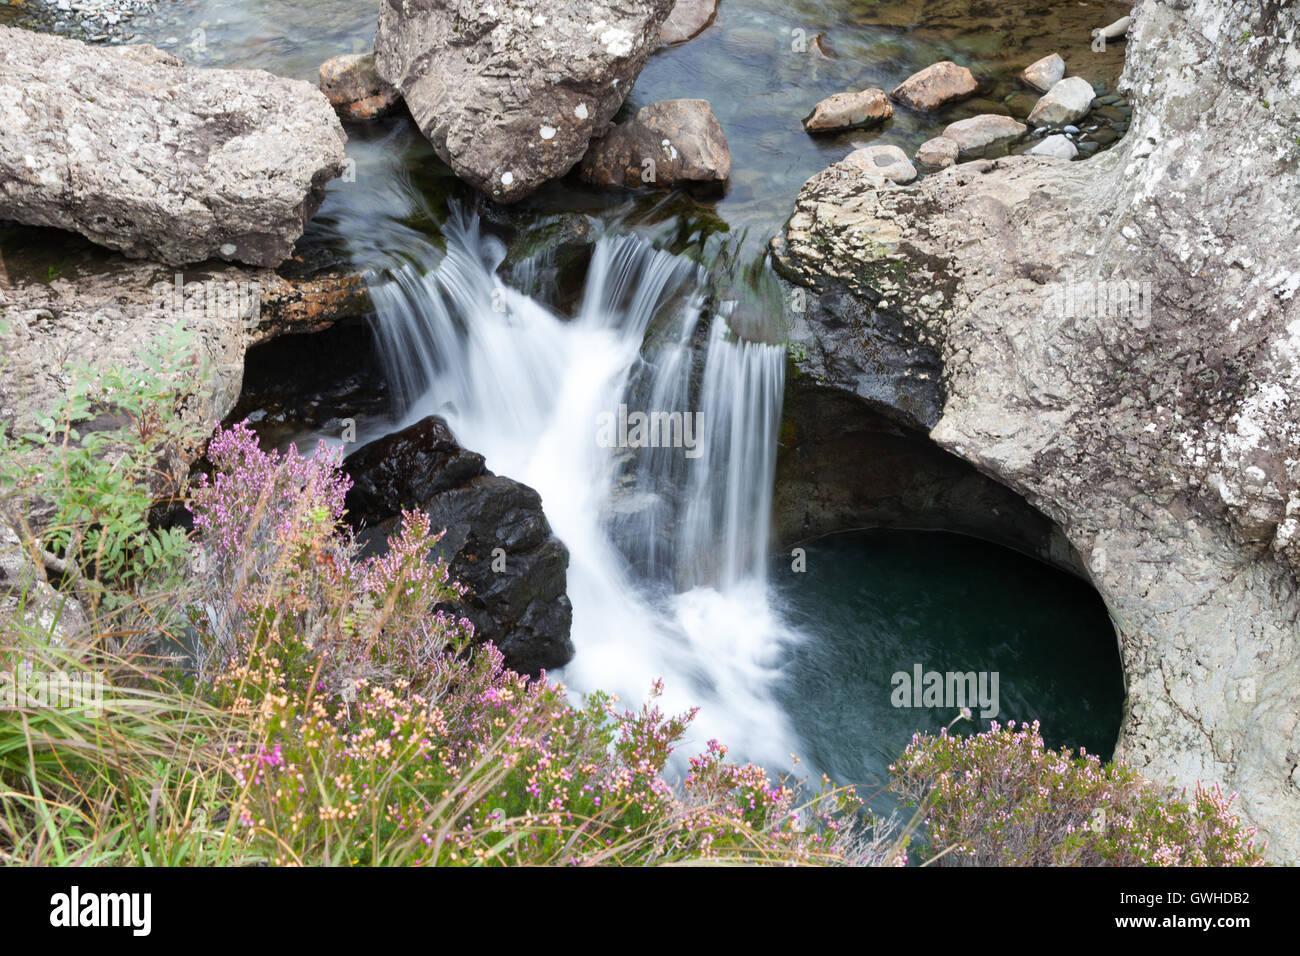 Fairy Pools, Skye, Scotland - Stock Image